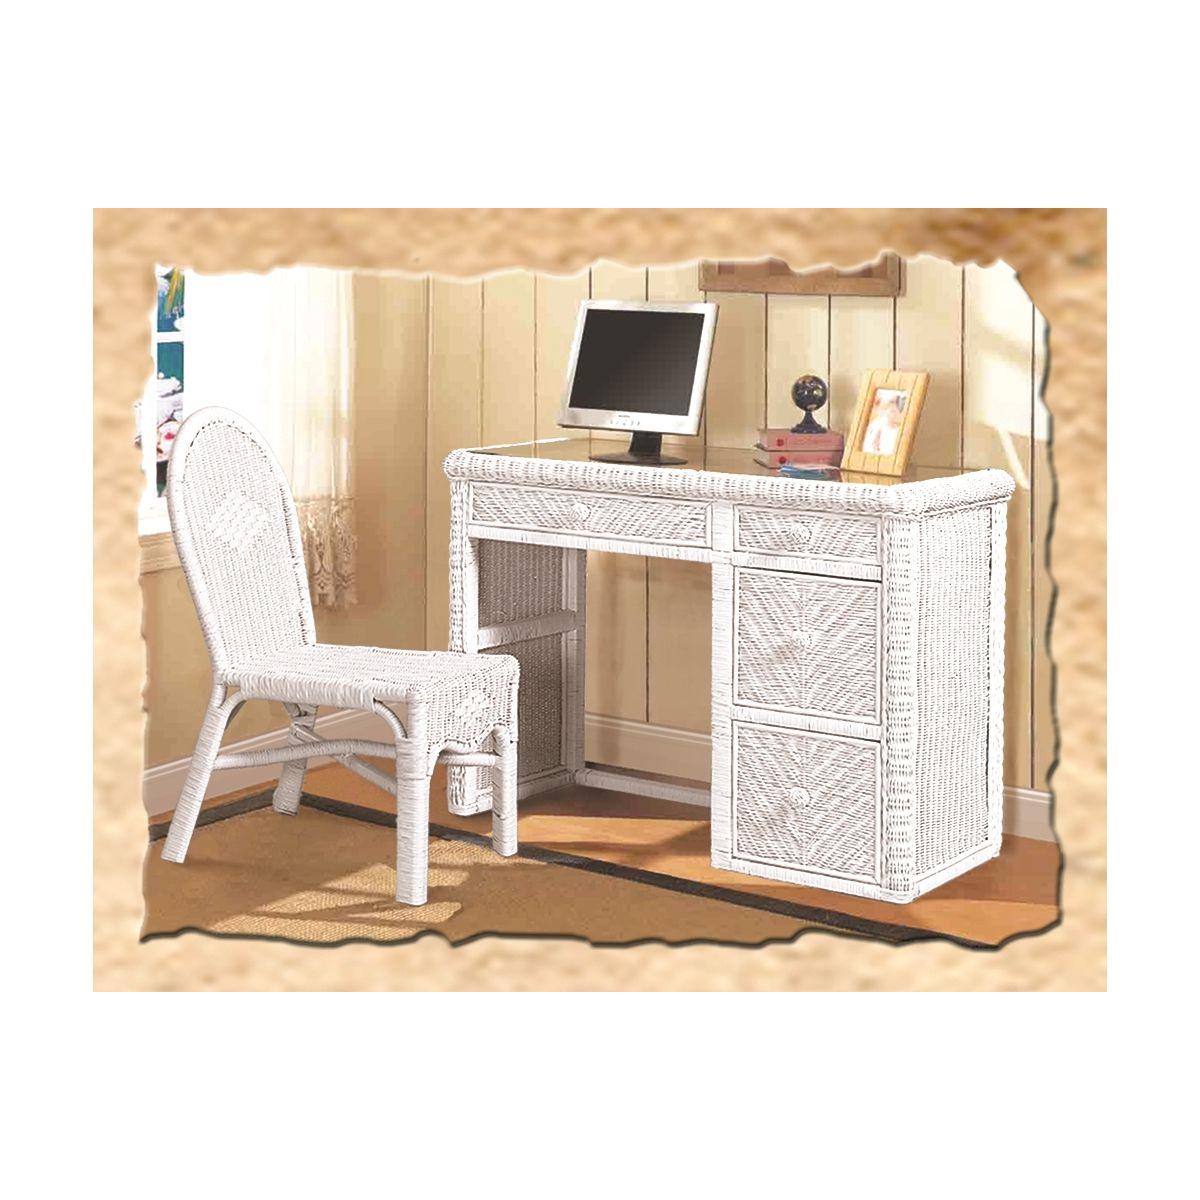 Image of: Sea Winds B57974 White Santa Cruz Computer Desk Chair Set In White Wicker